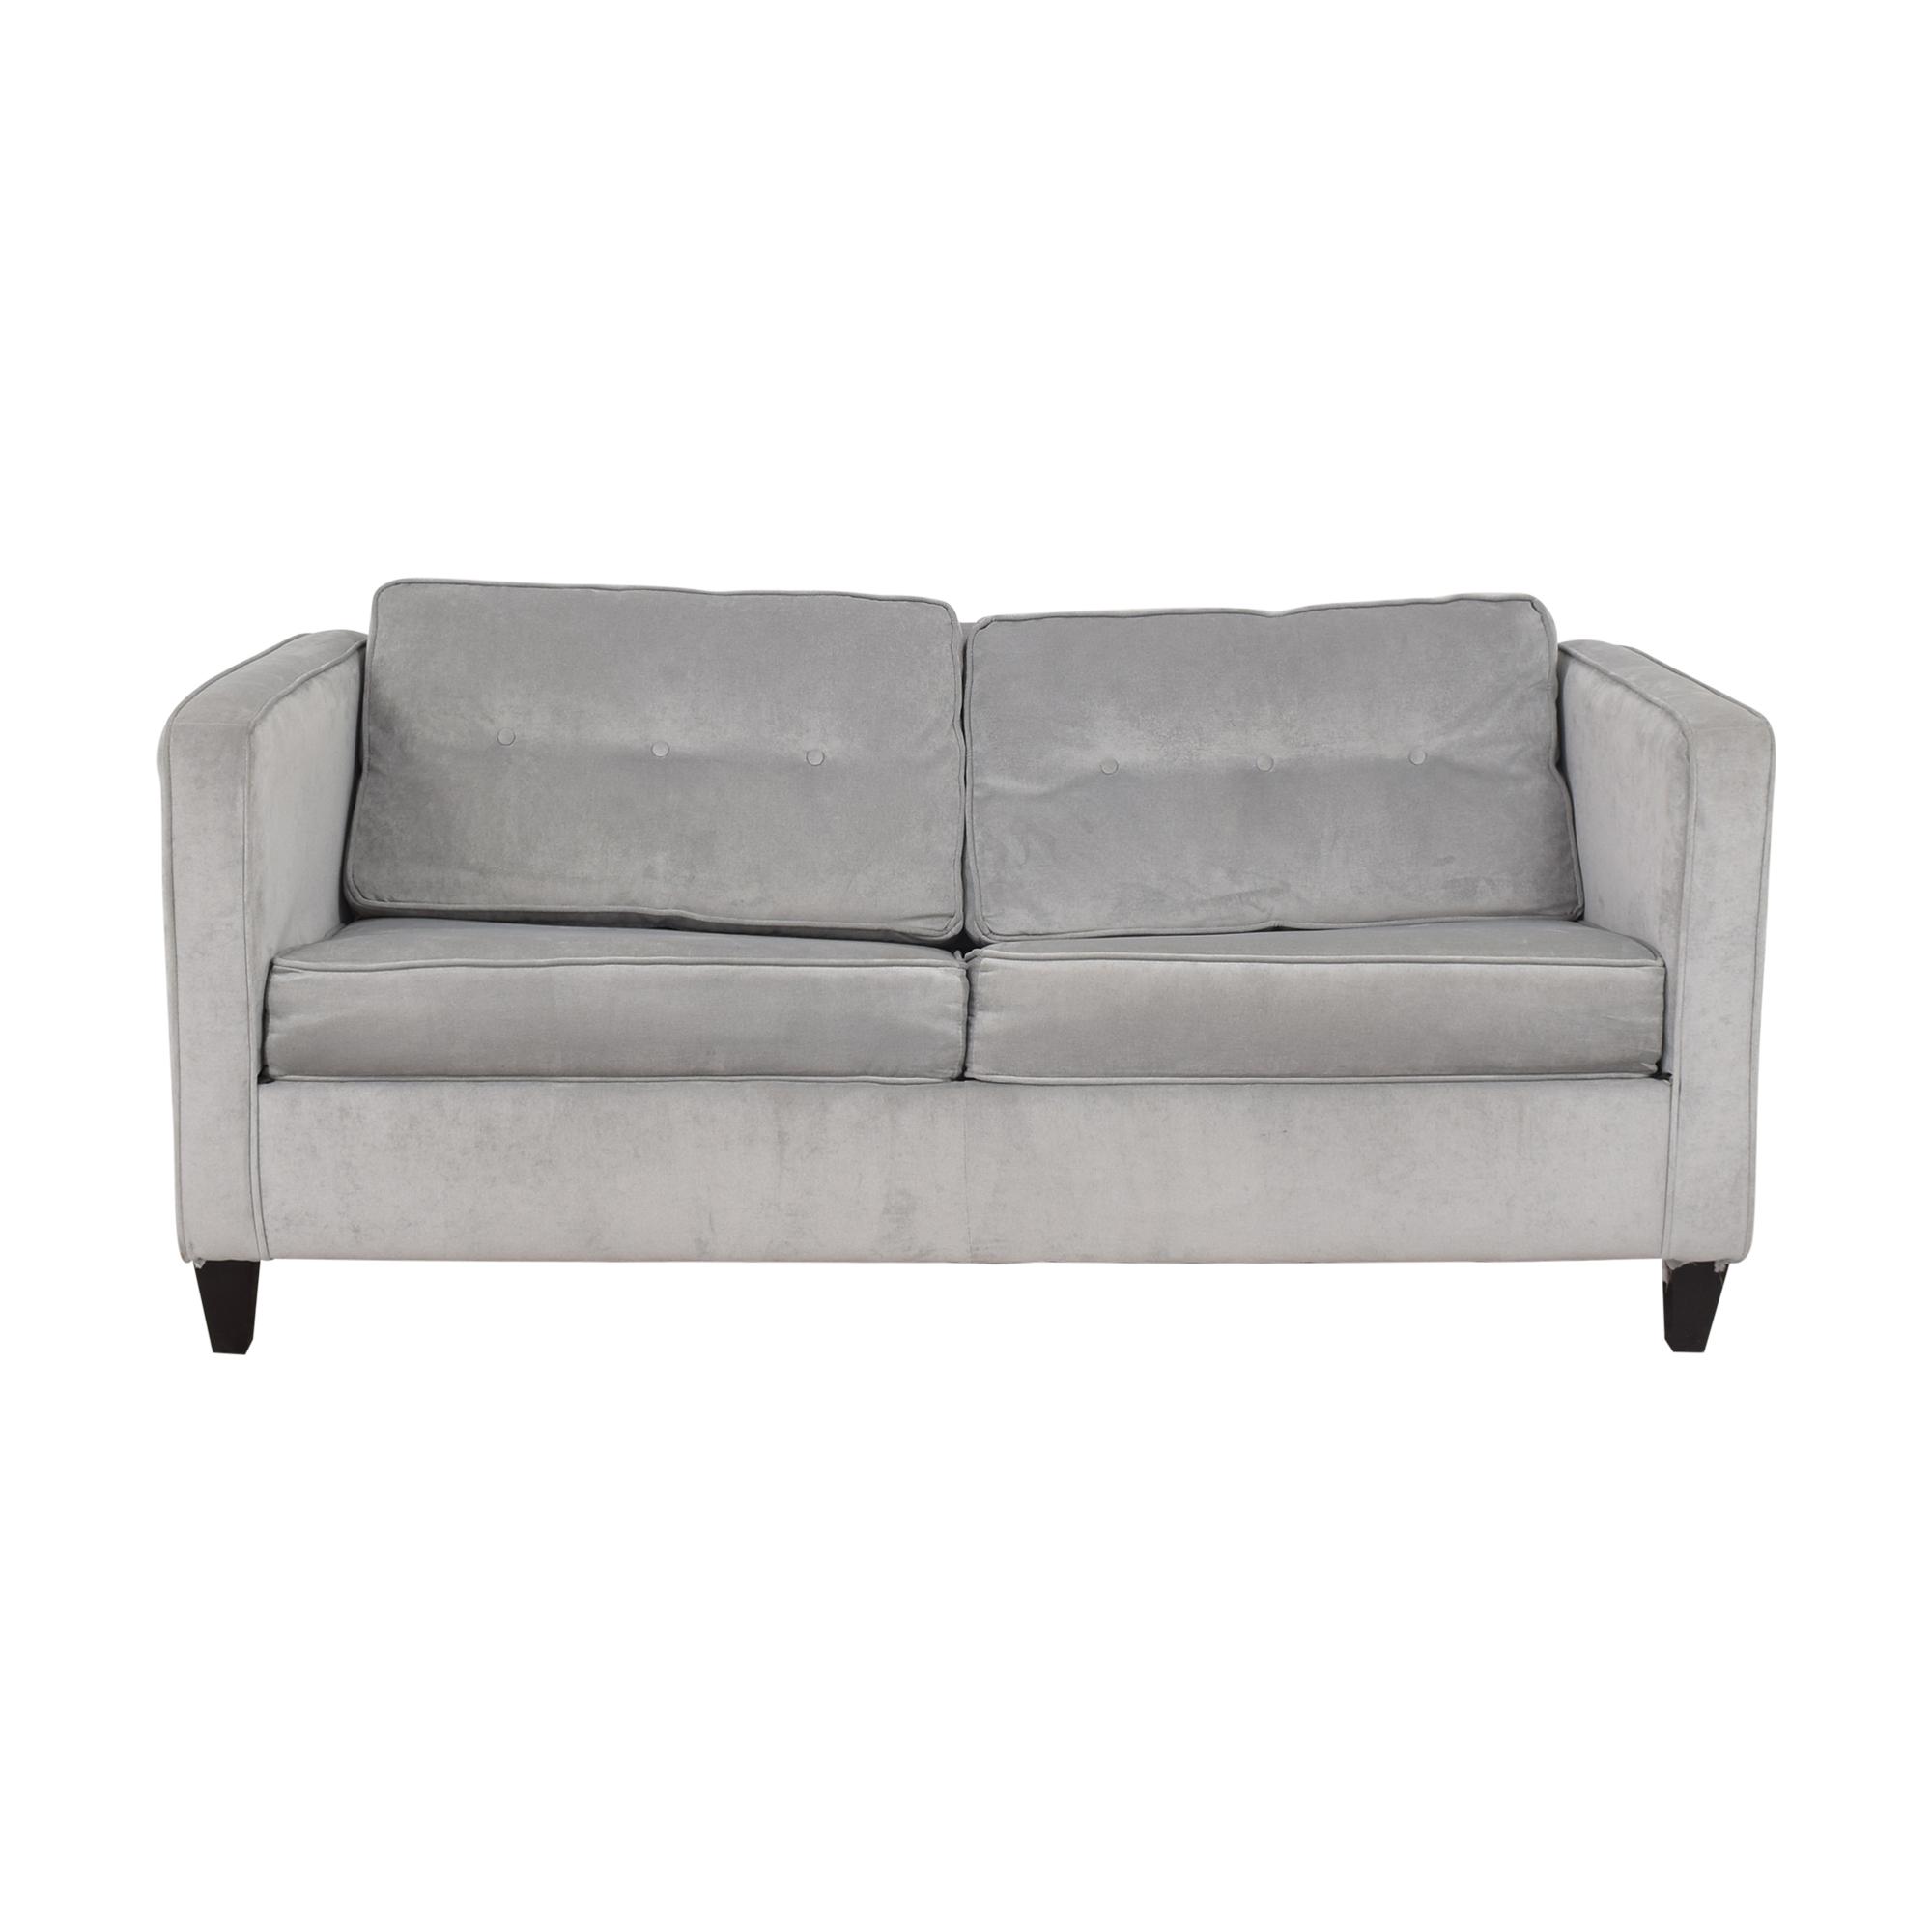 shop Wayfair Ebern Designs Dengler Square Arm Sleeper Sofa Wayfair Sofa Beds